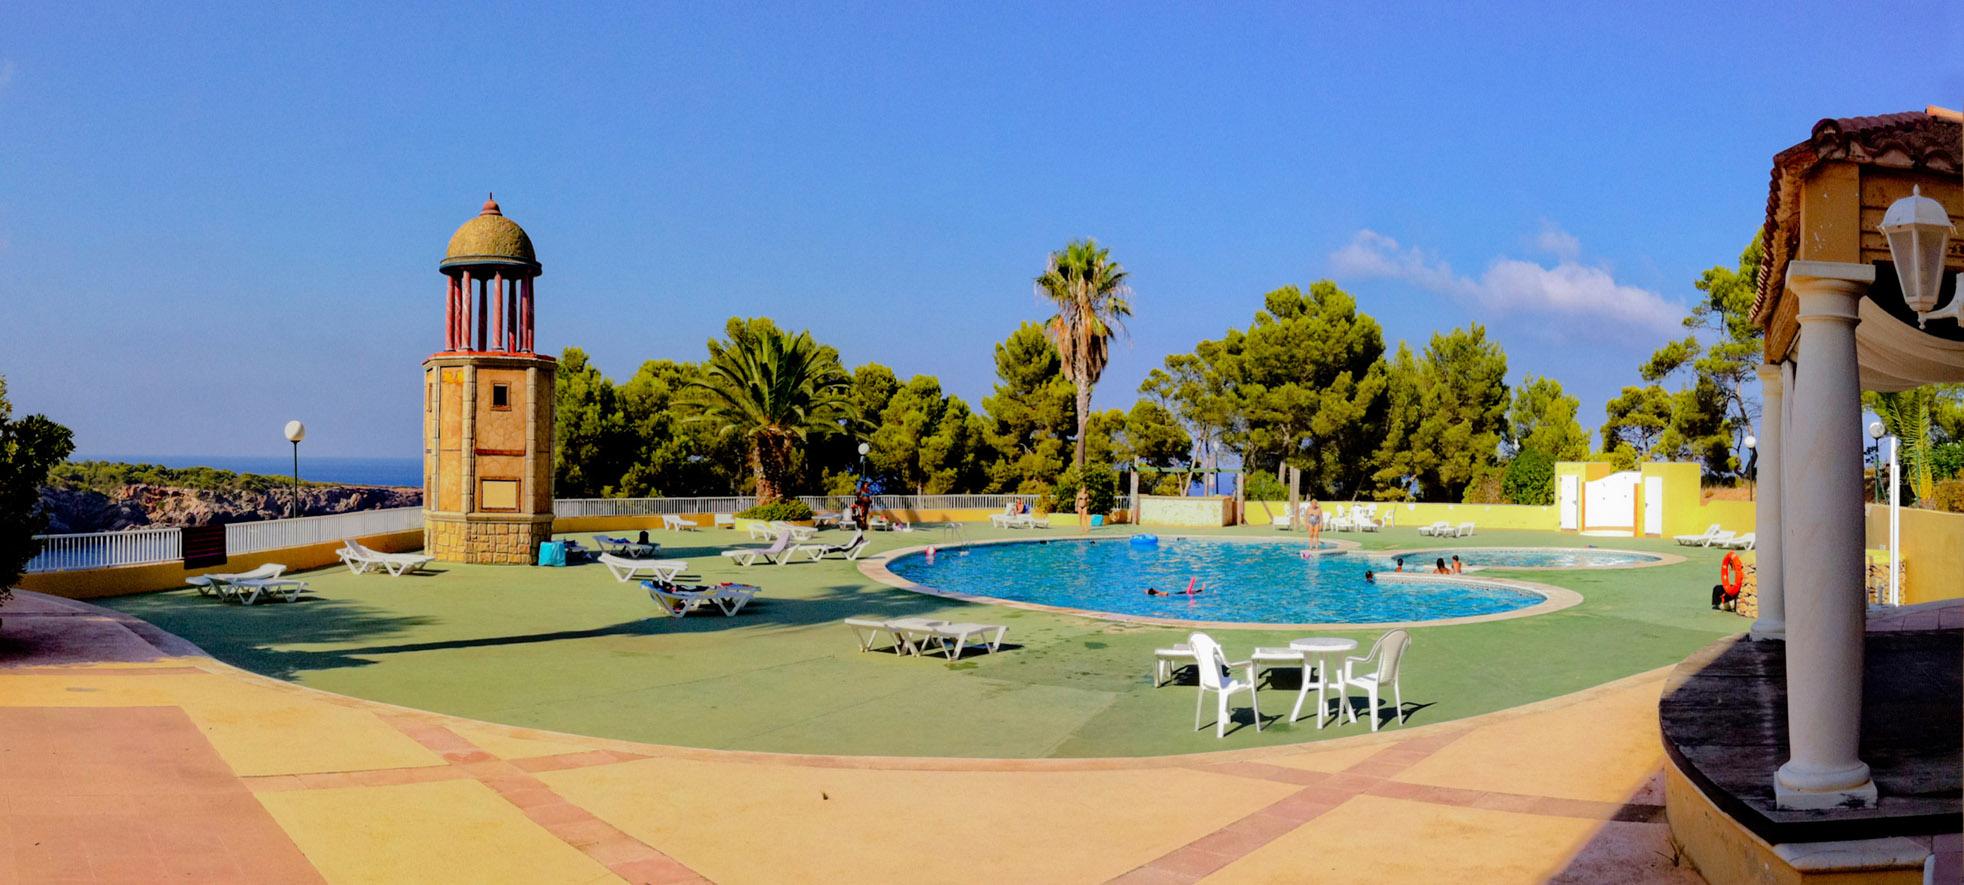 Ibiza community pool